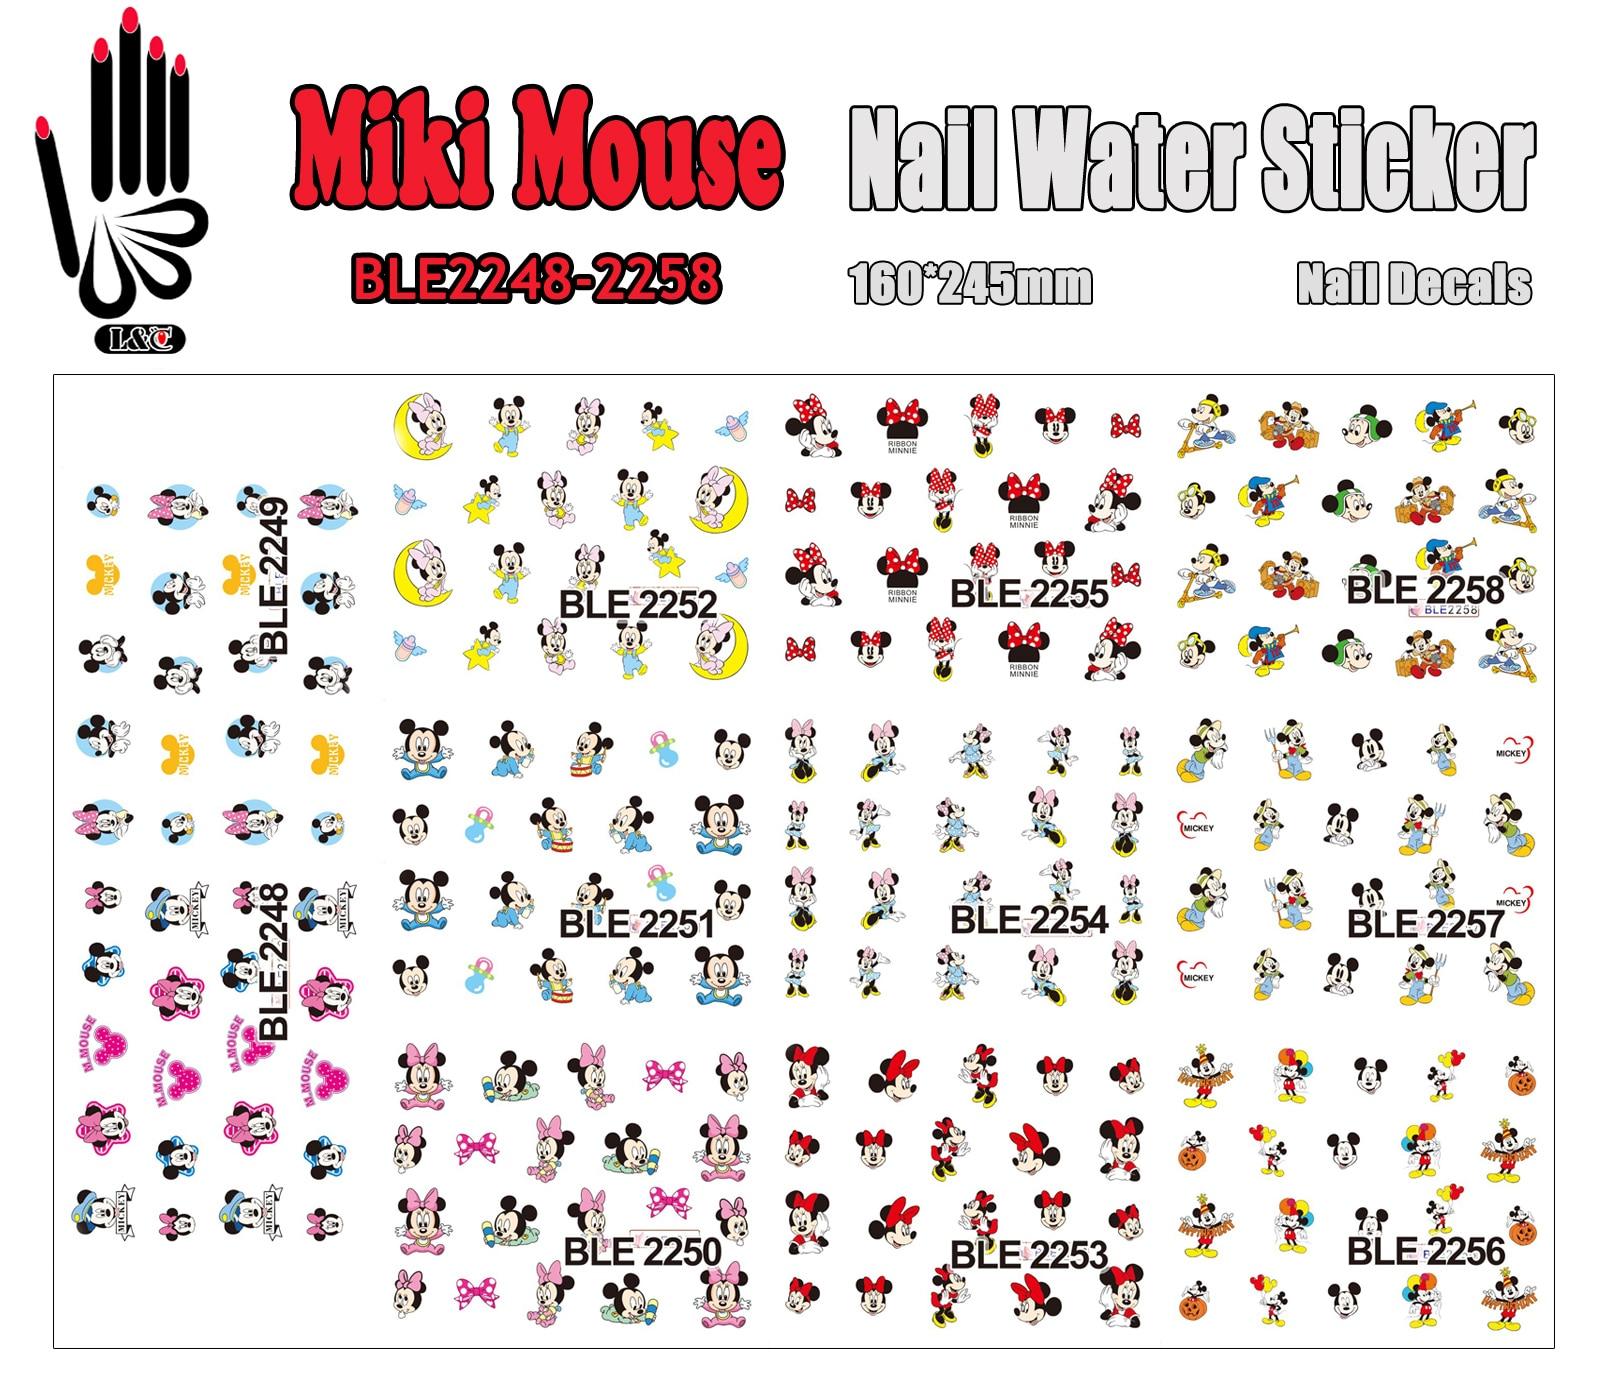 11 Sheets/Lot Nail Art BLE2248-2258 Cartoon Mouse Nail Art Water Transfer Sticker for Nail Wraps(11 DESIGNS IN 1) nail art large piece yb529 540 12 designs in 1 cartoon pet hello kitty nail art water transfer sticker decal for nail